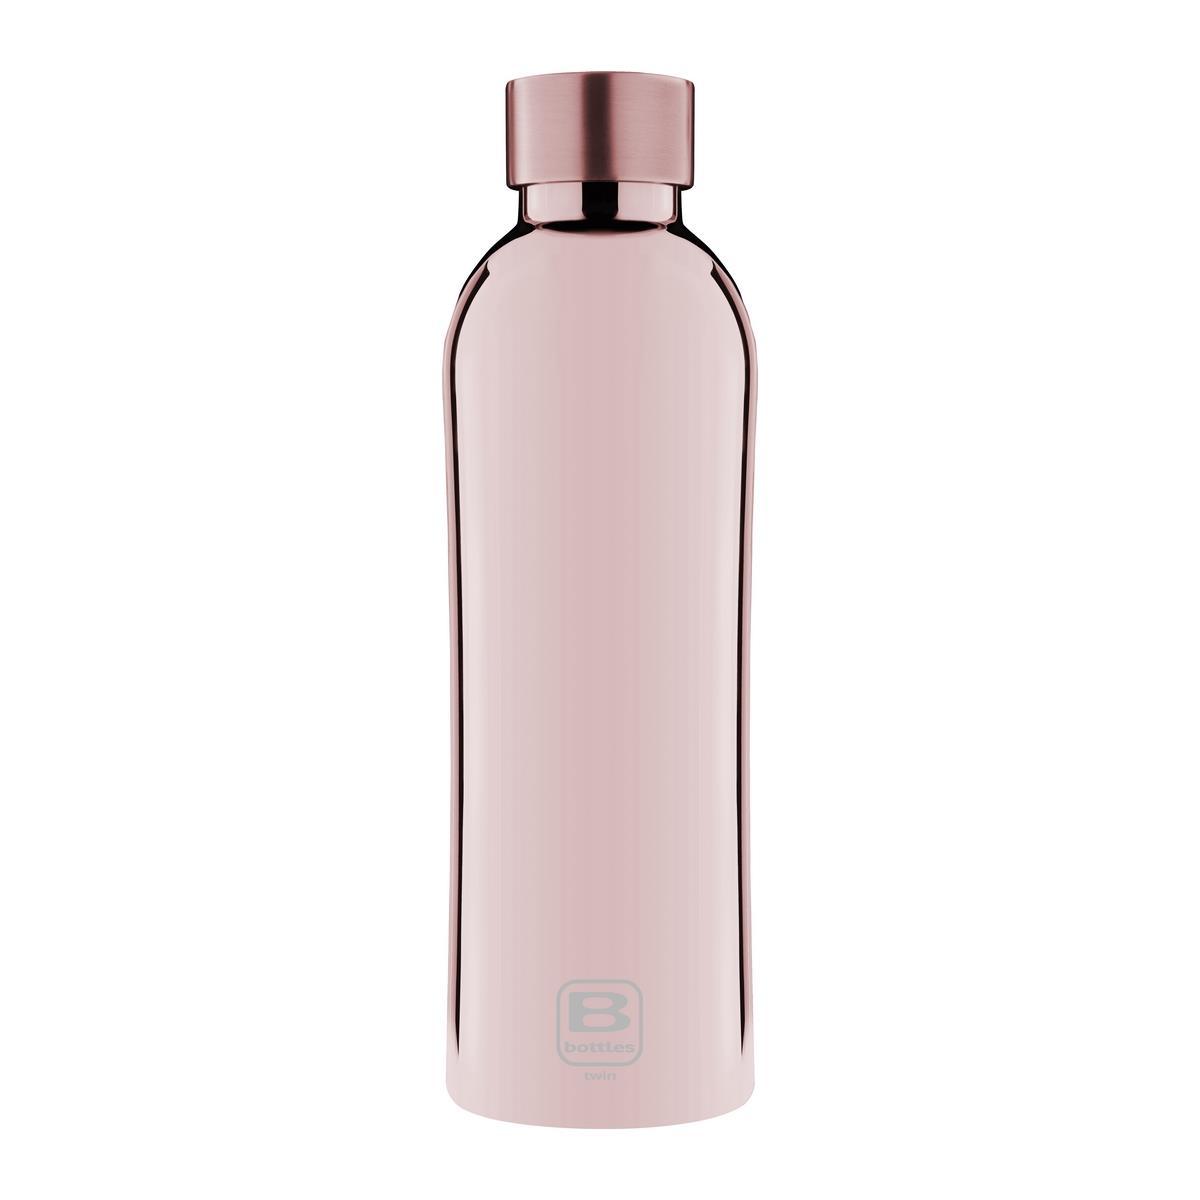 B Bottles Twin - Rose Gold Lux - 800 ml - Bottiglia Termica a doppia parete in acciaio inox 18/10